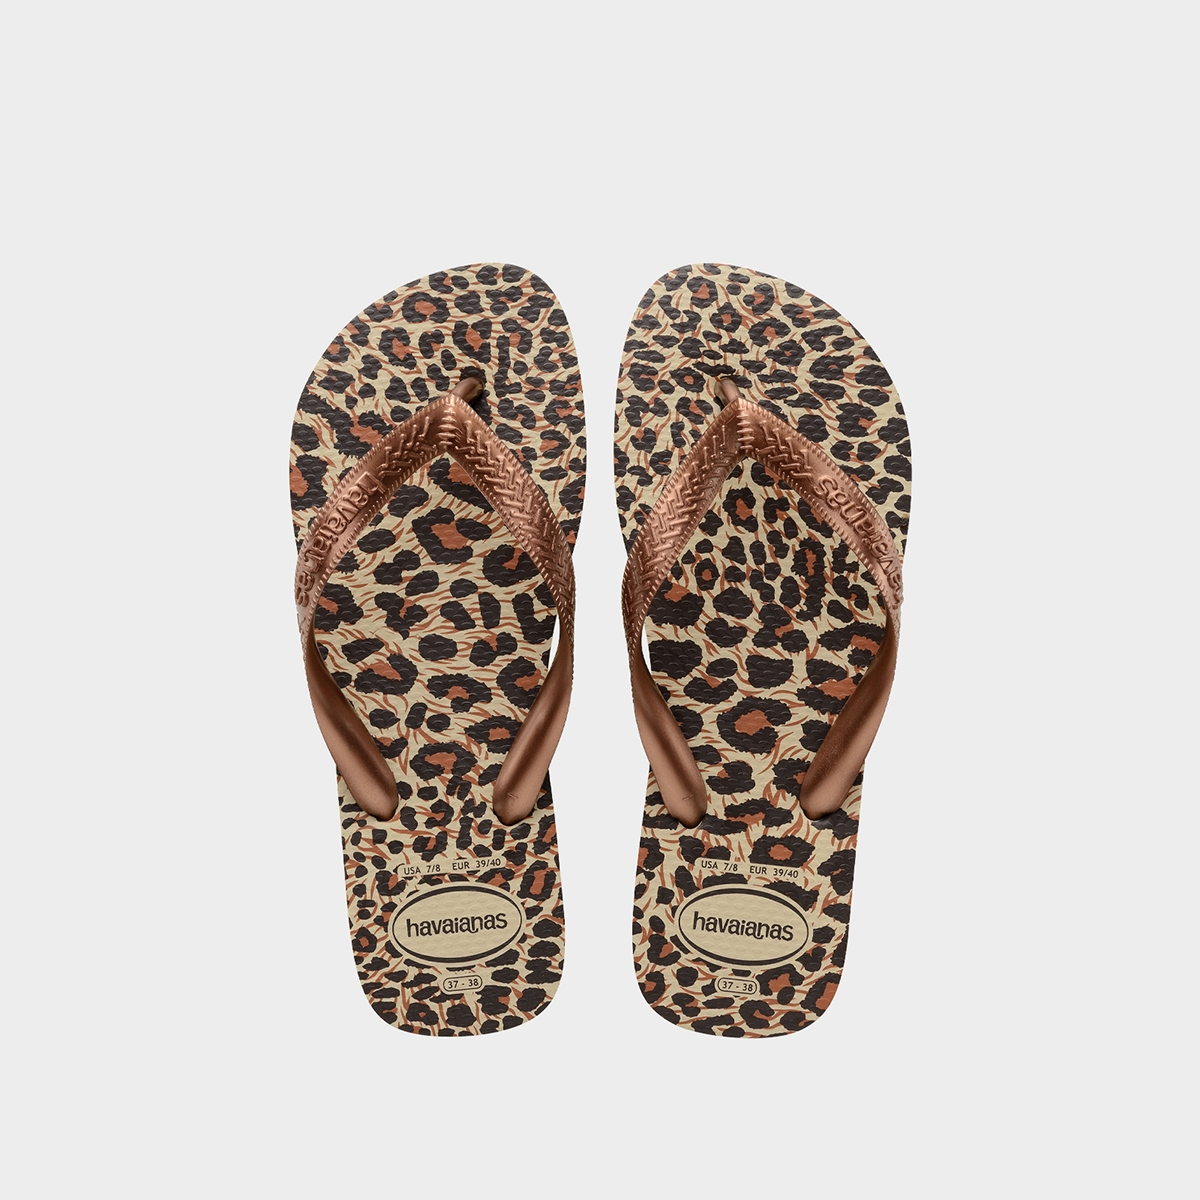 Havaianas Top Animals Sandals Print